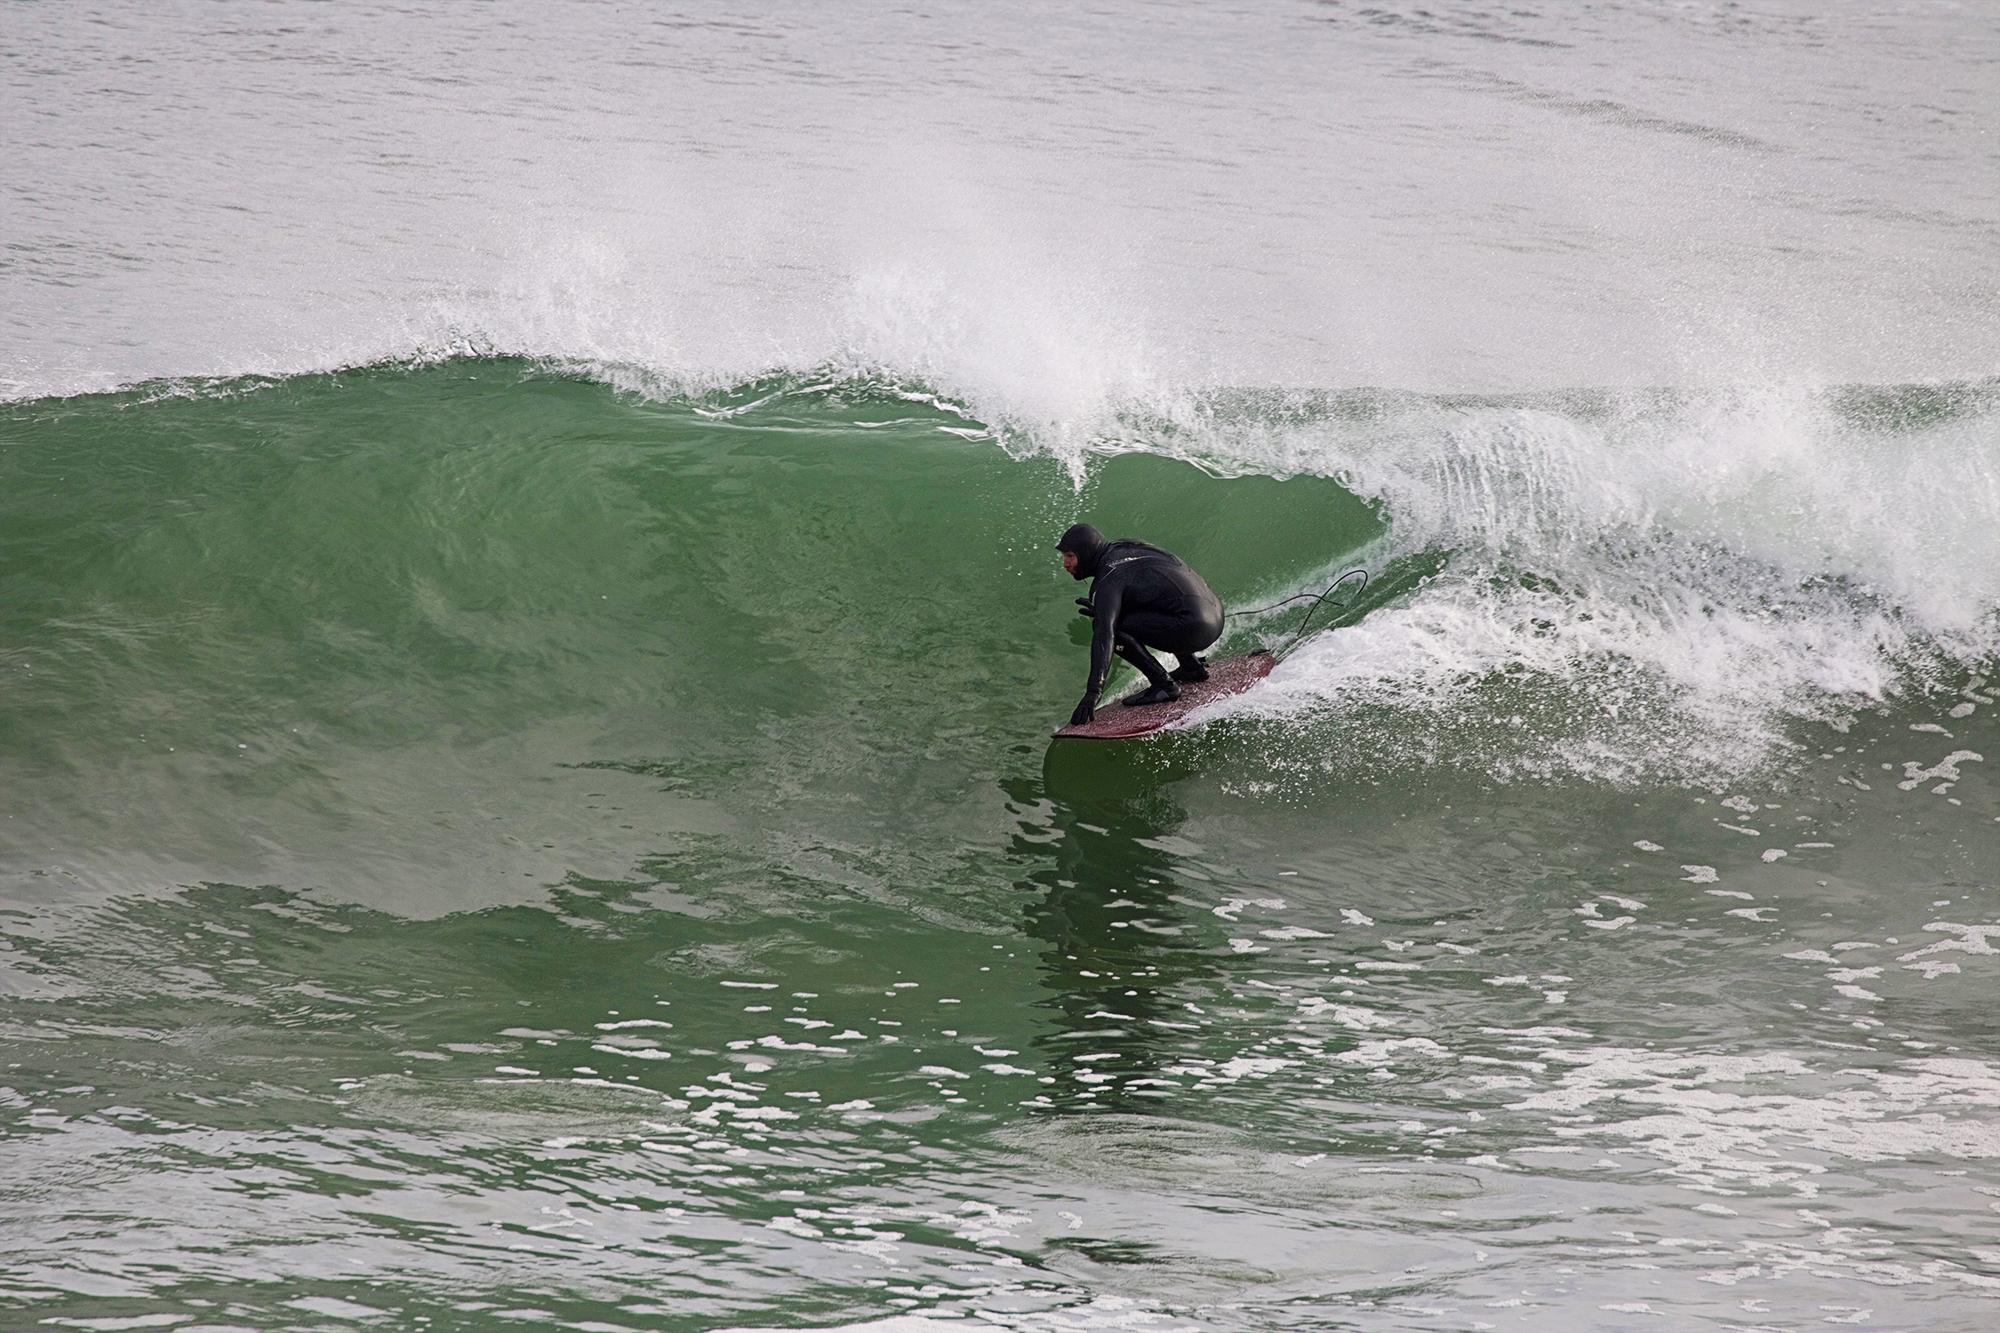 1-19-17 MTK Surfer 19.jpg